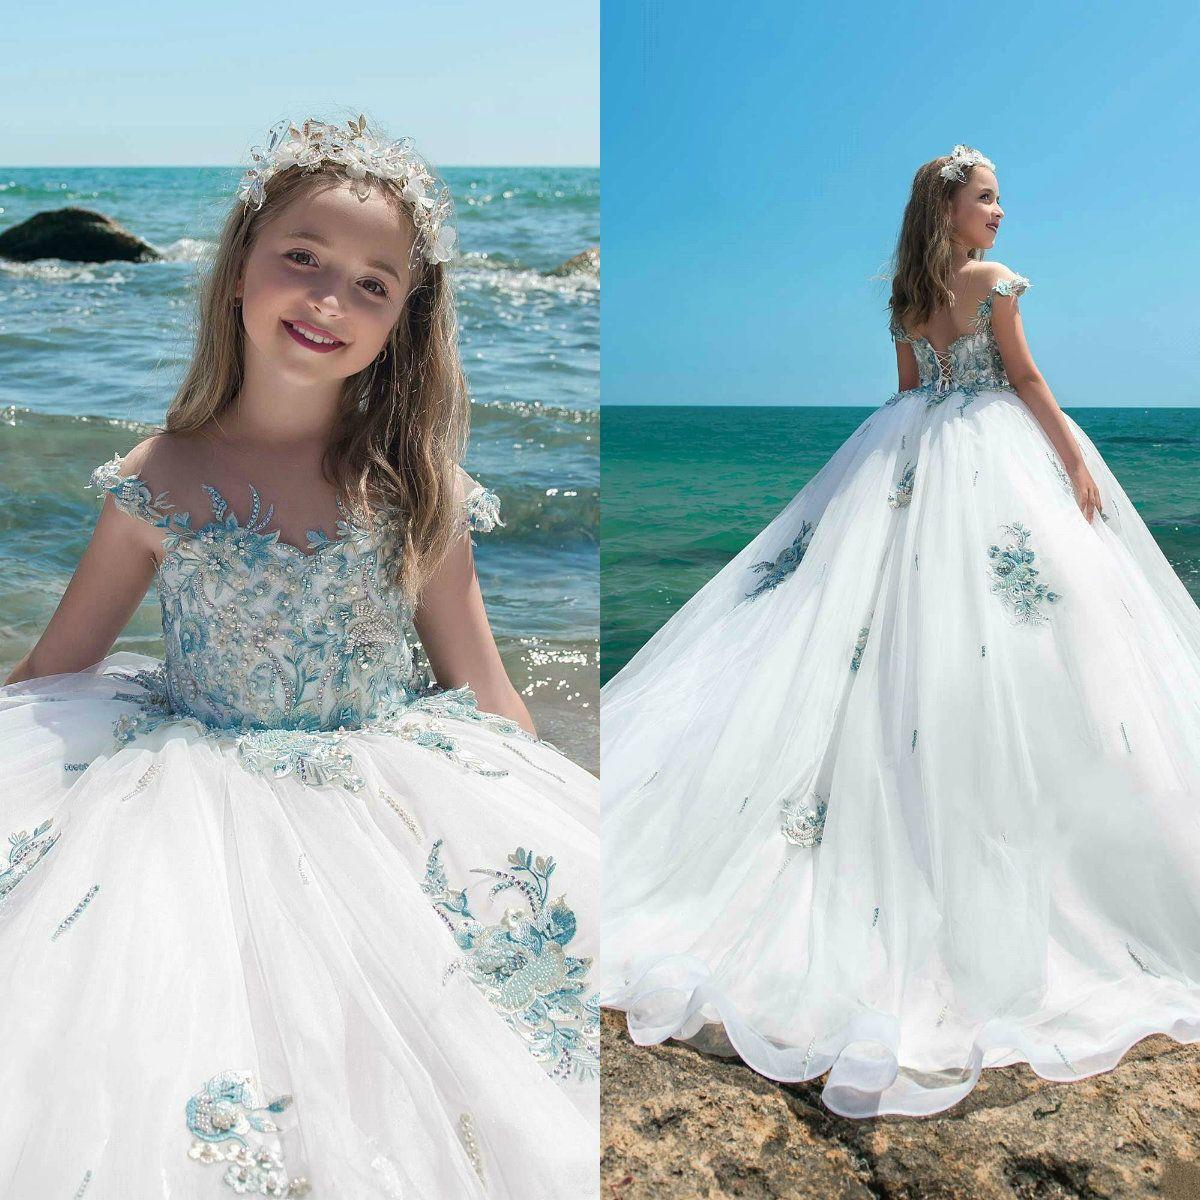 5ebc07f4b0a 2019 Pretty Flower Girl Dresses For Wedding Sheer Neck Lace Applique  Rhinestones Kids Designer Clothes Custom Made Girls Pageant Dresses Little  Girls ...